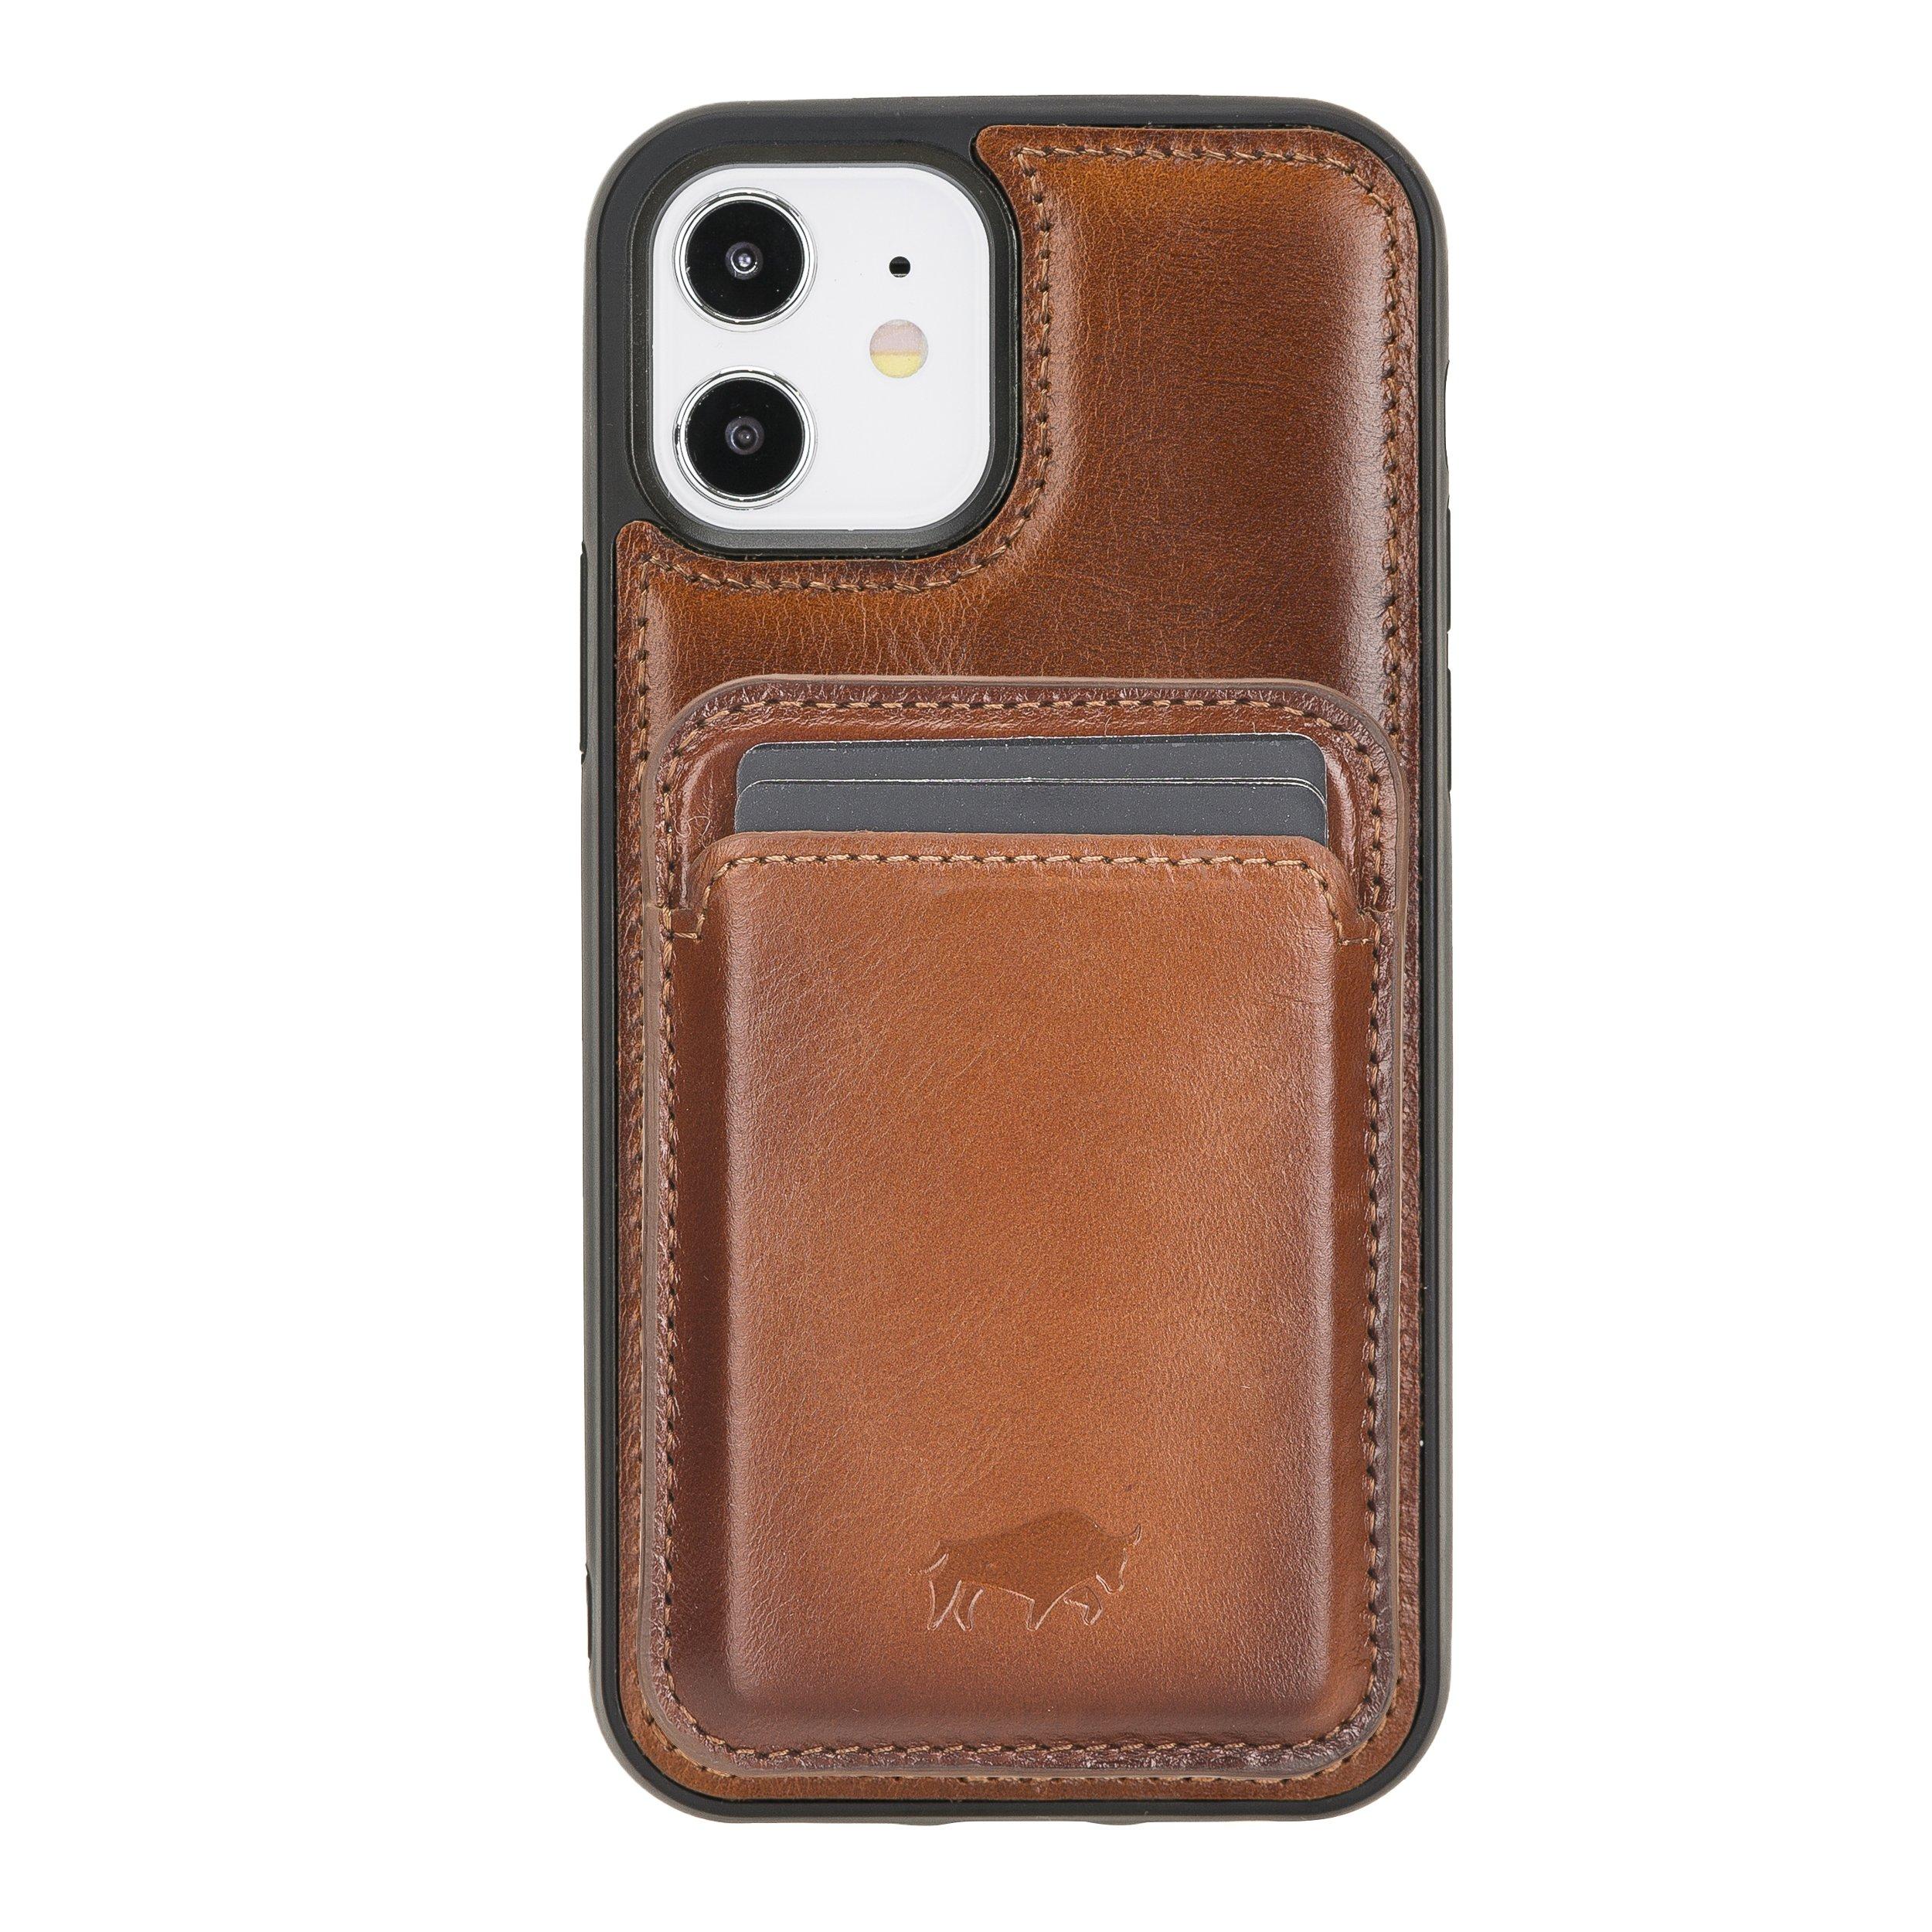 Solo Pelle Lederhülle + magnetische Geldbörse (Magsafe) für das iPhone 12 Pro Max in 6.7 Zoll Case Leder Hülle Ledertasche Backcover aus echtem Leder (Steingrau)